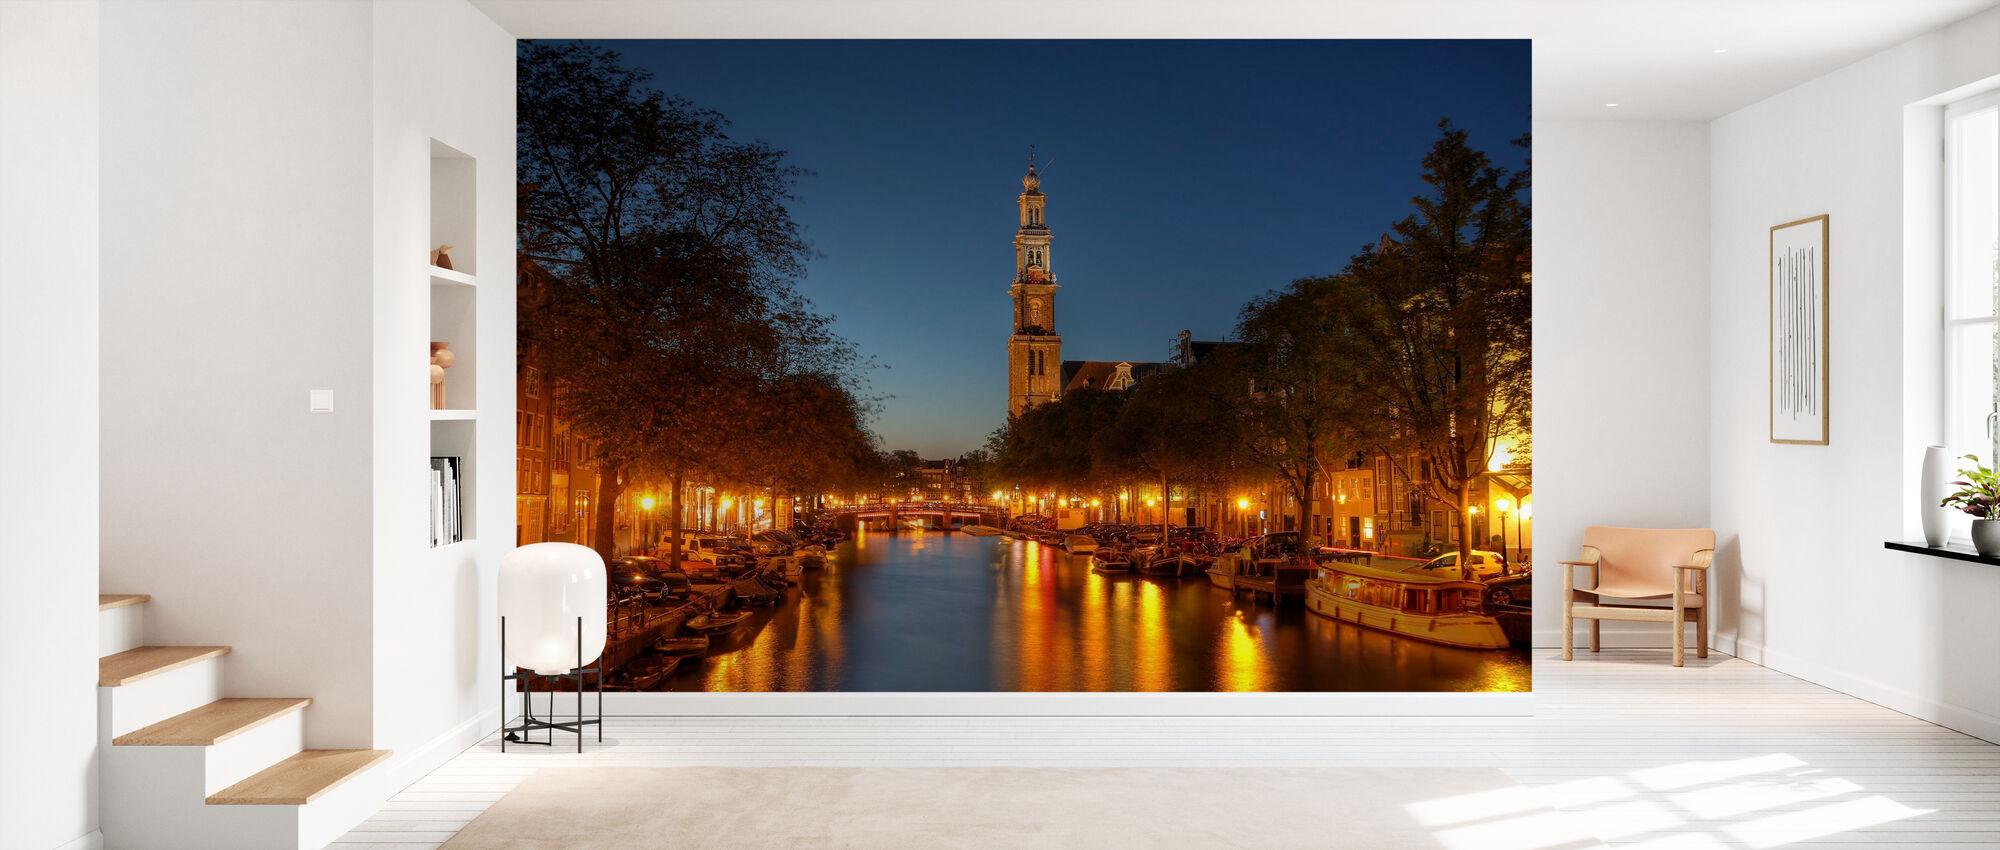 Prinsengracht Canal in Amsterdam - Tapete - Flur